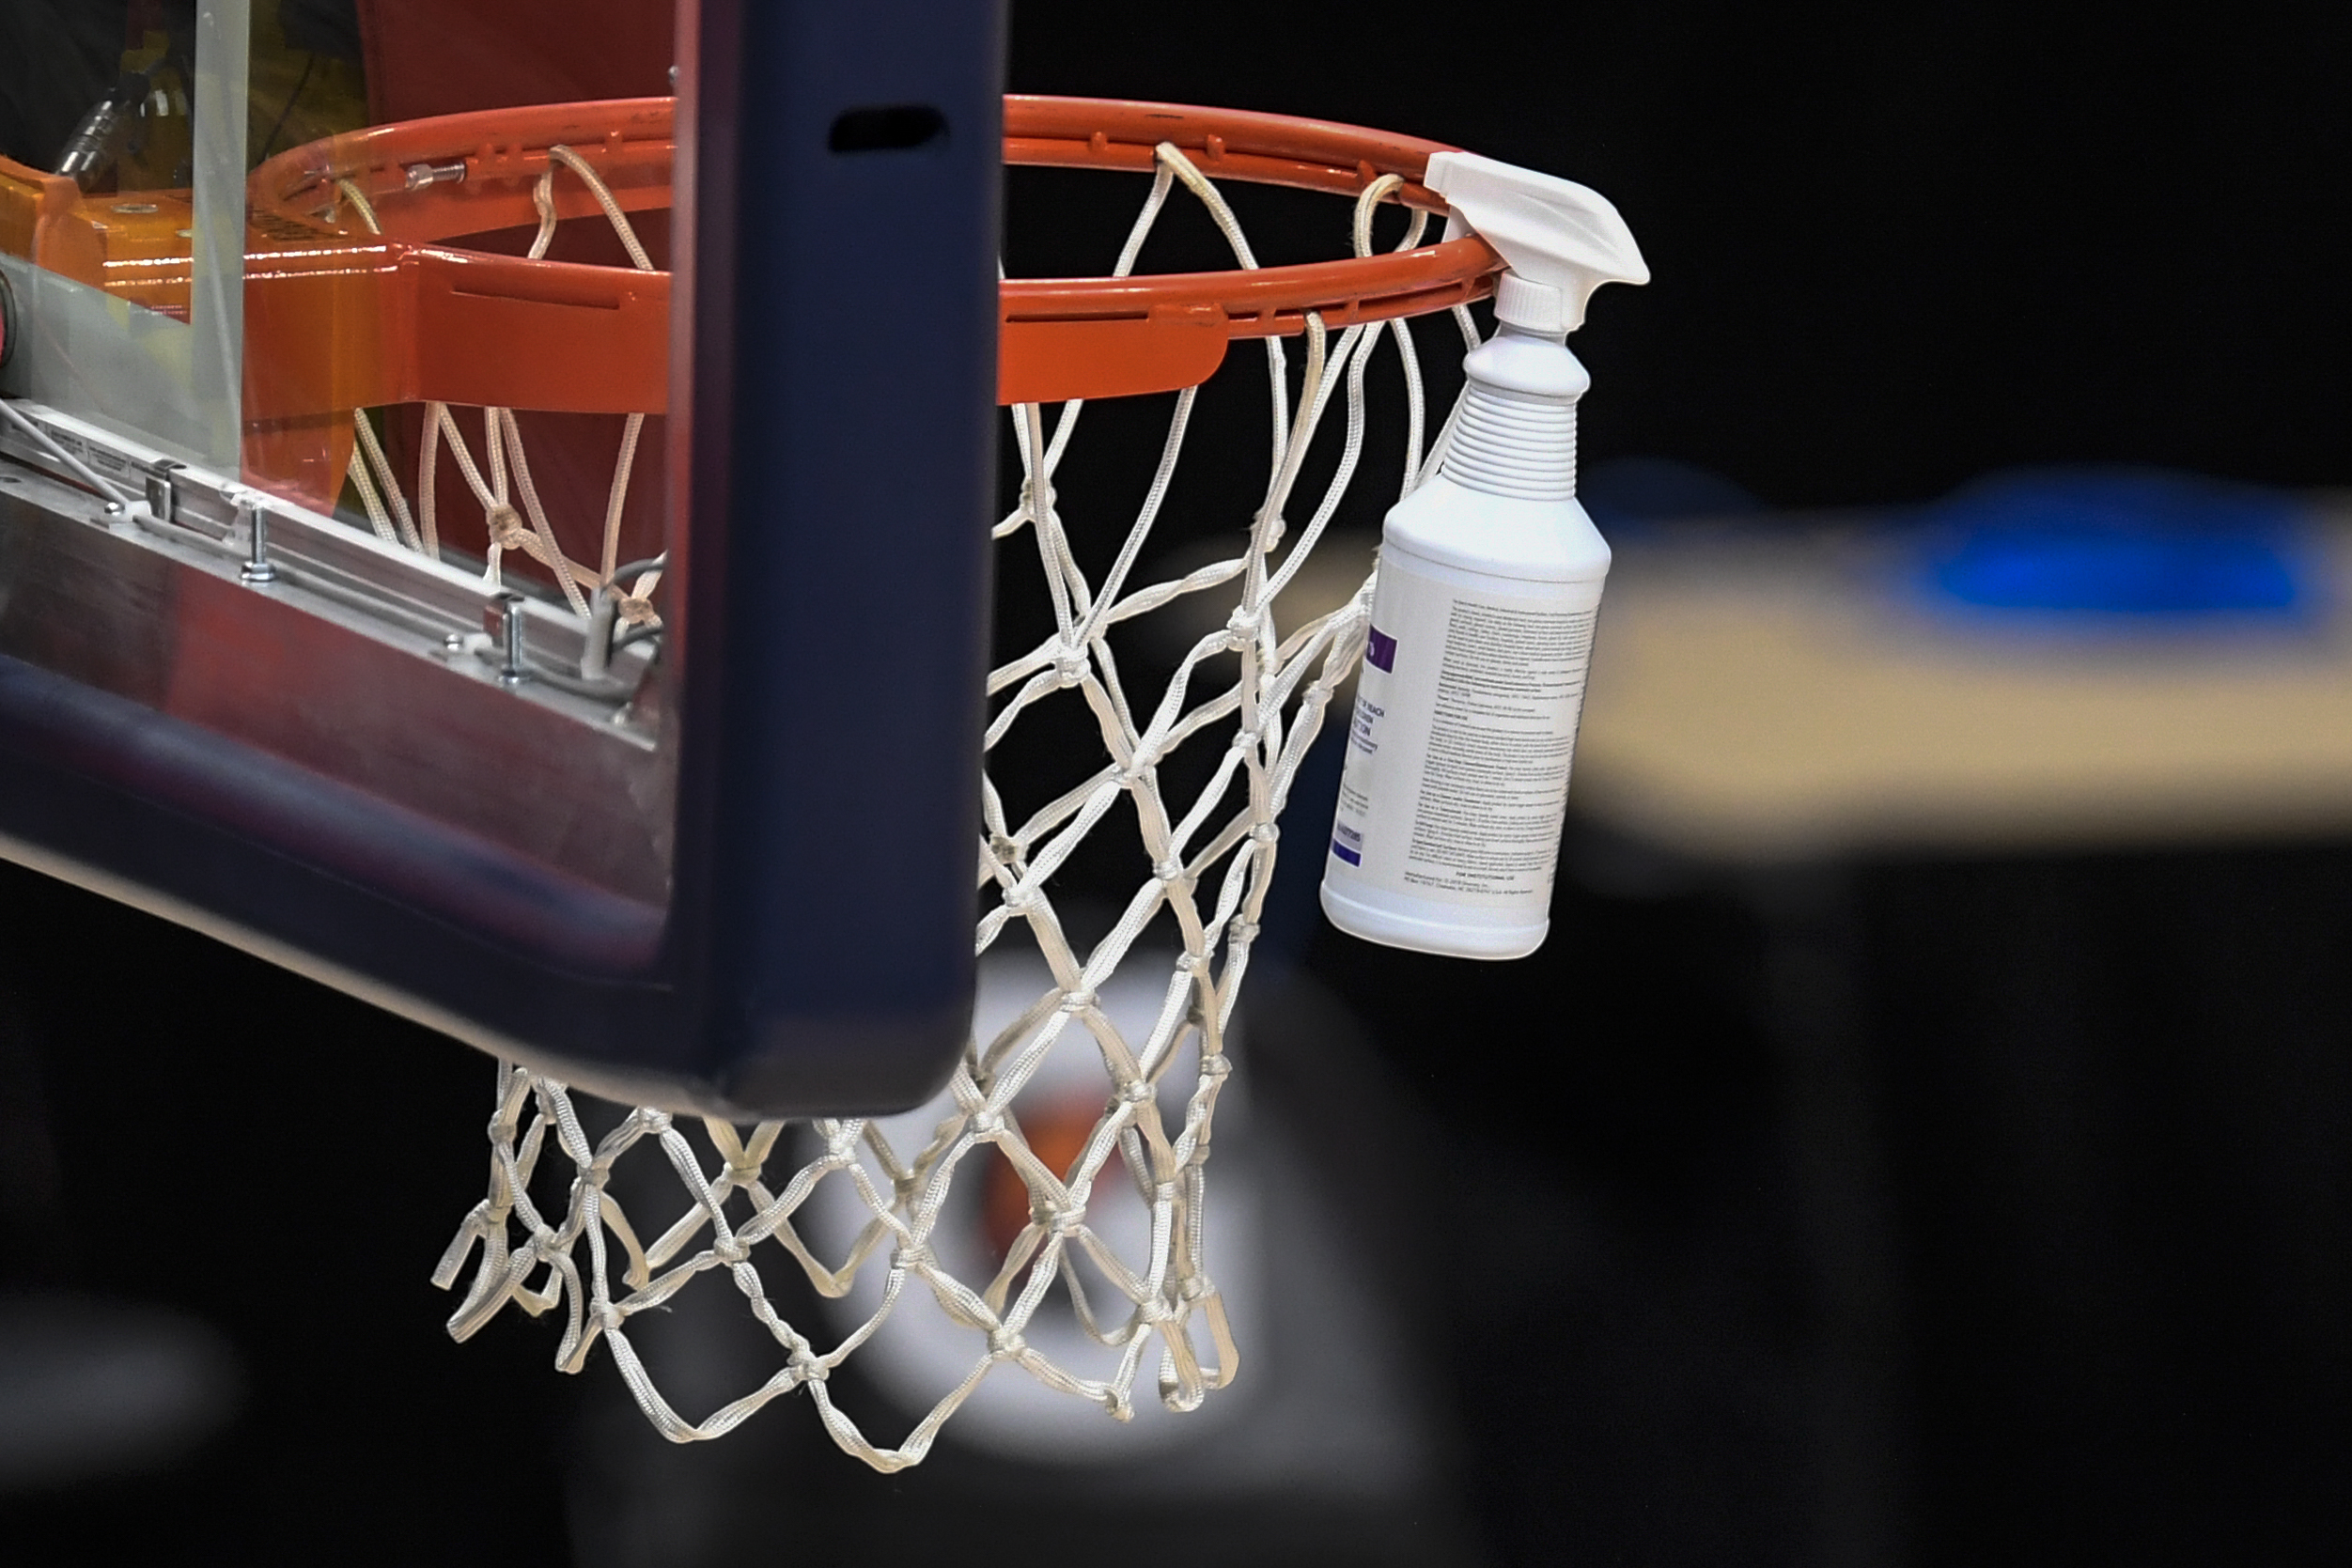 DENVER NUGGETS VS DETROIT PISTONS, NBA